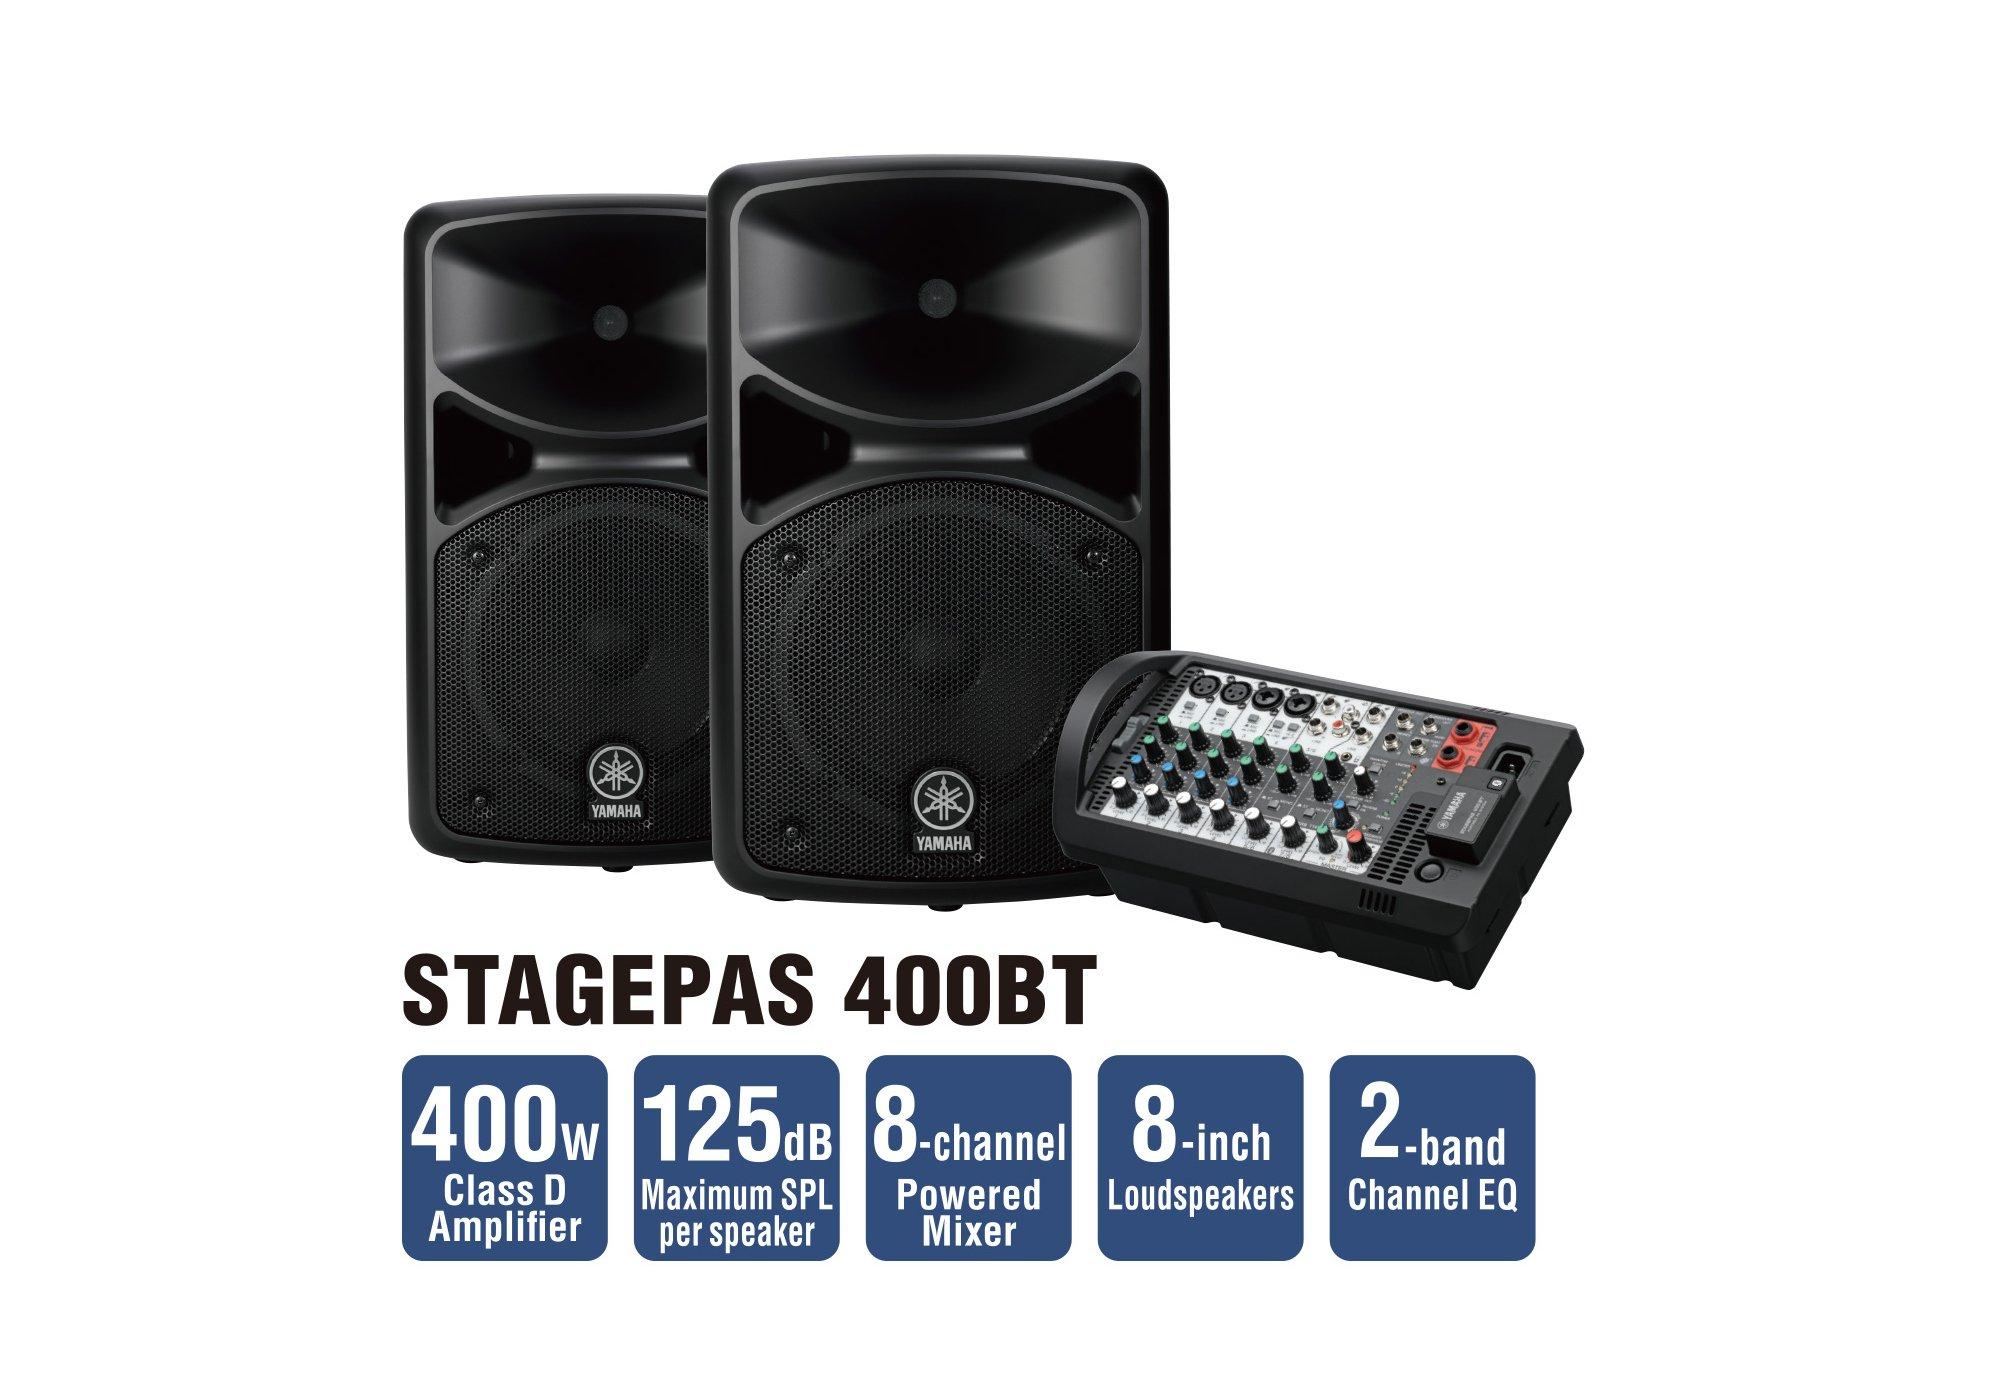 yamaha stagepas 400bt 400w 8 channel portable pa system. Black Bedroom Furniture Sets. Home Design Ideas